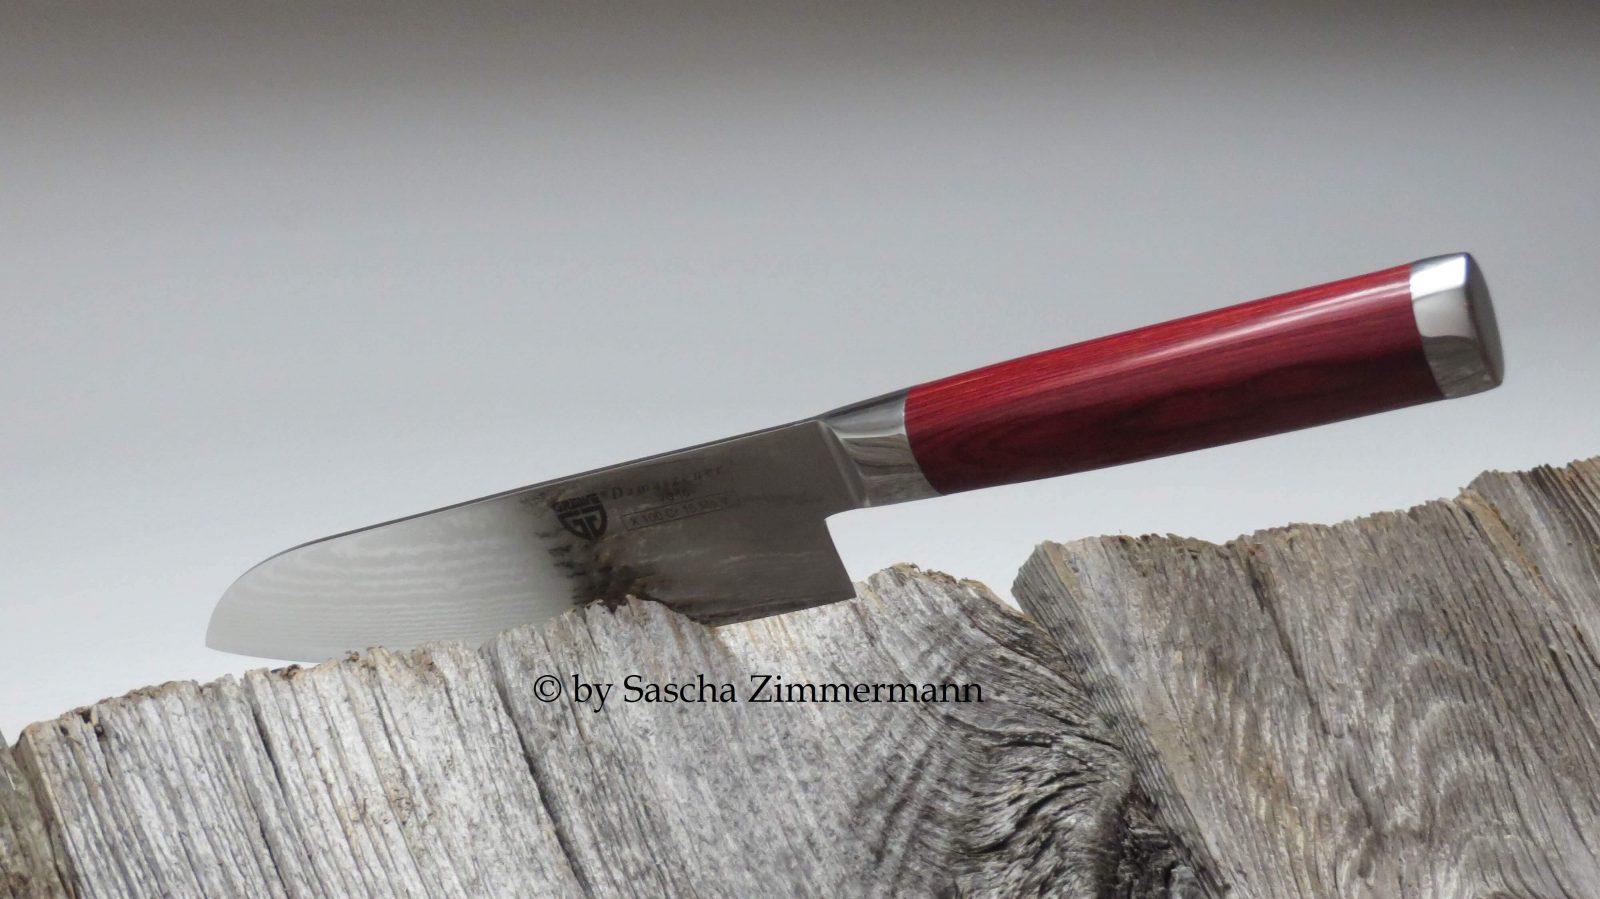 GRÄWE Damastmesser Santoku mit Hartholzgriff Damastmesser Copyright2